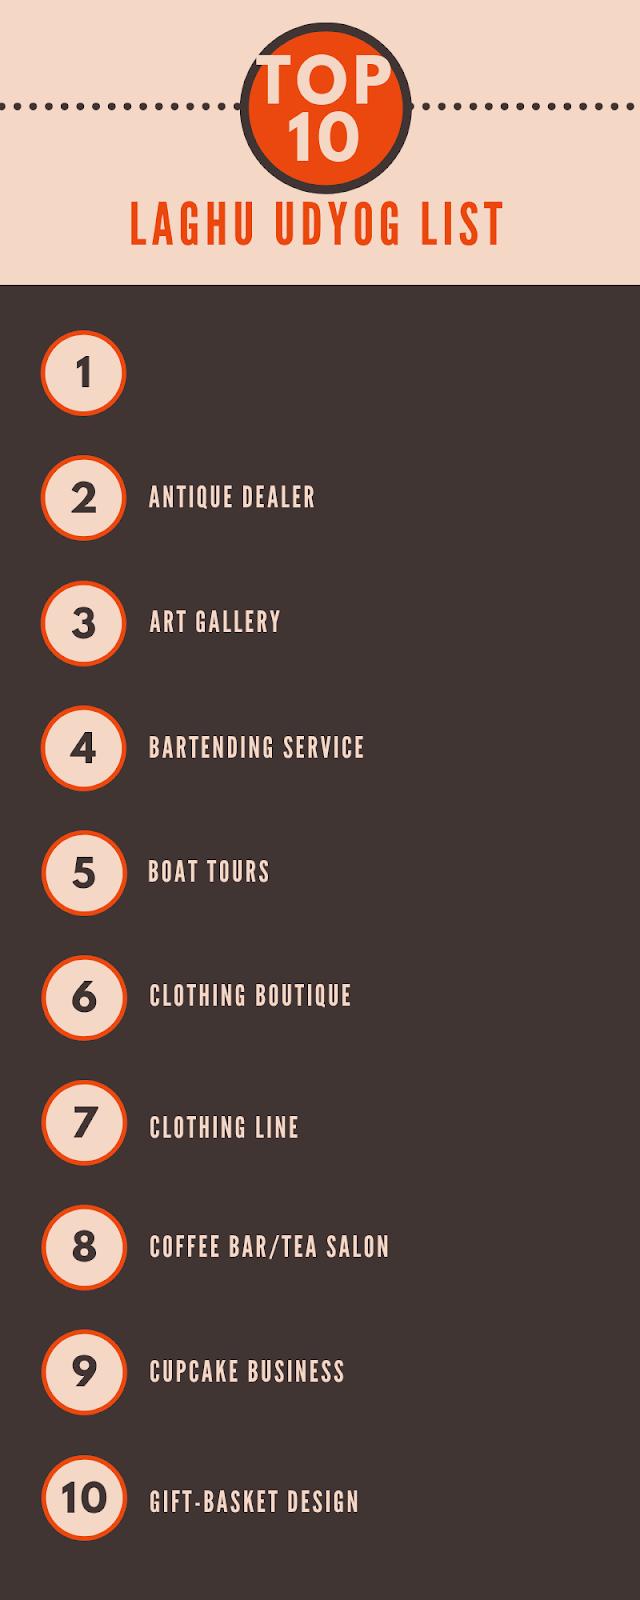 This infographic is all about Top 10 laghu udyog list  लघु एवं कुटीर उद्योग, लघु उद्योग के बारे में जानकारी, घरेलू उद्योग, लघु उद्योग लिस्ट laghu udyog and kutir udyog in Hindi,small business in hindi